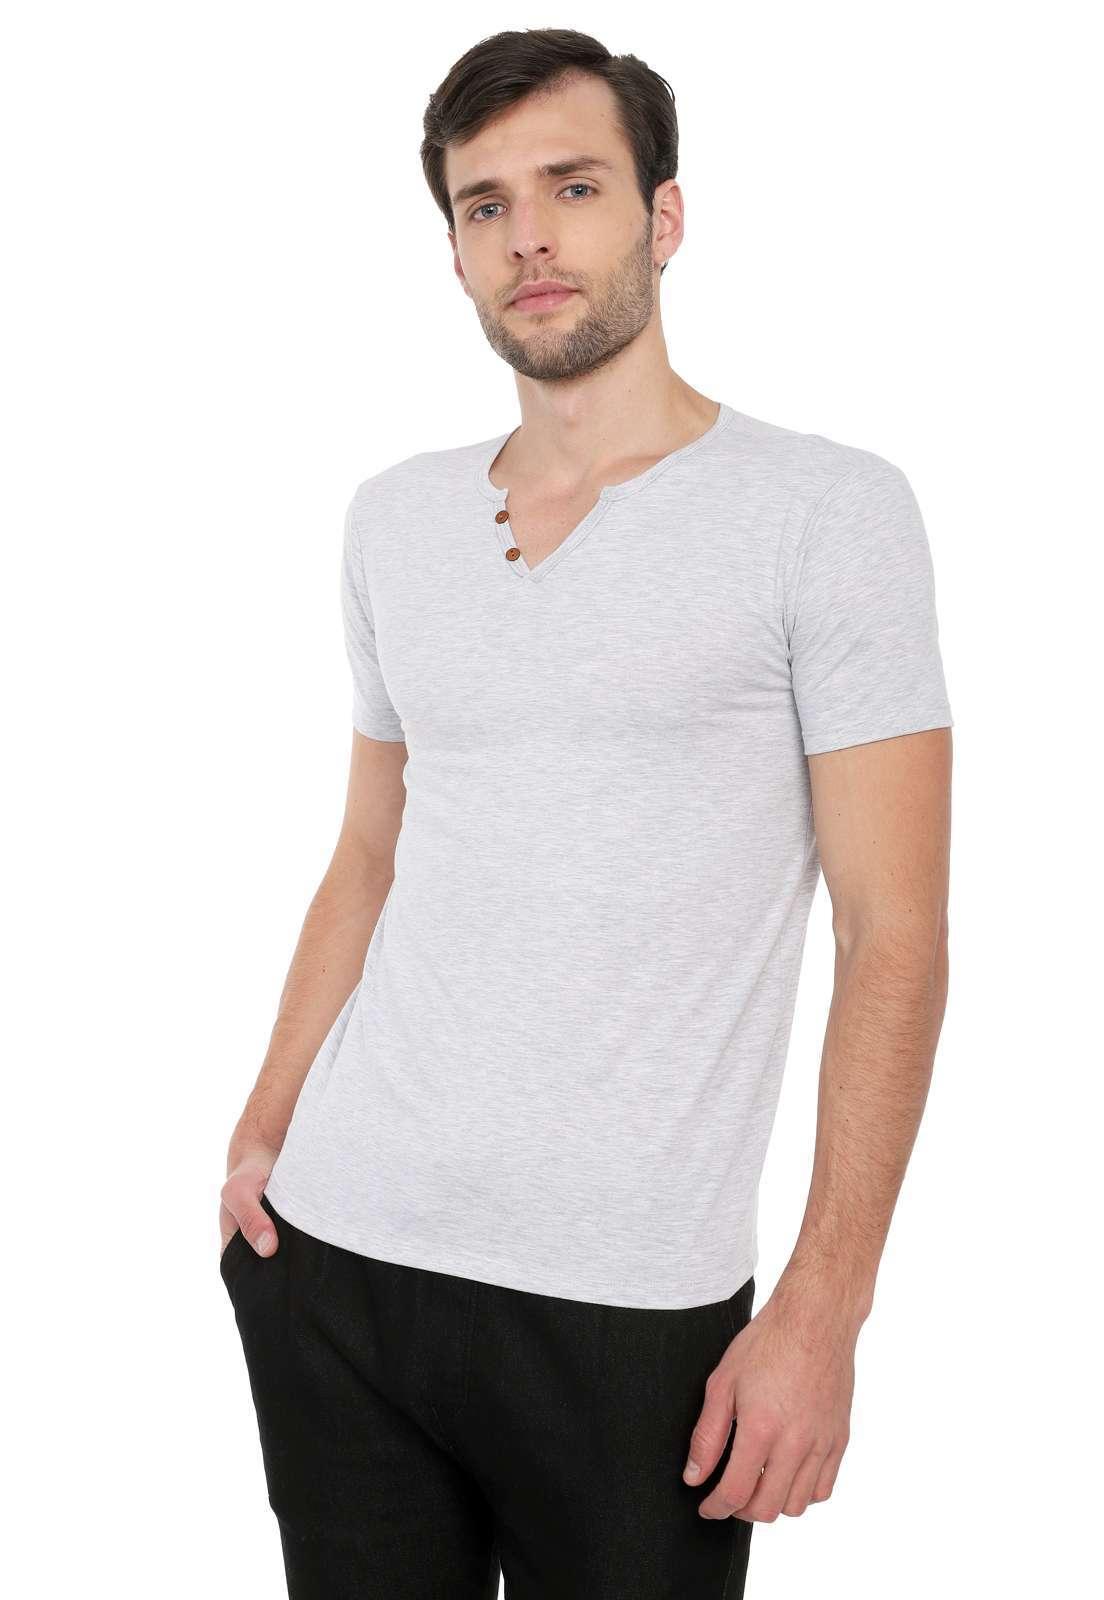 Camiseta Con Botones Licrada - Gris Jaspe | Polovers